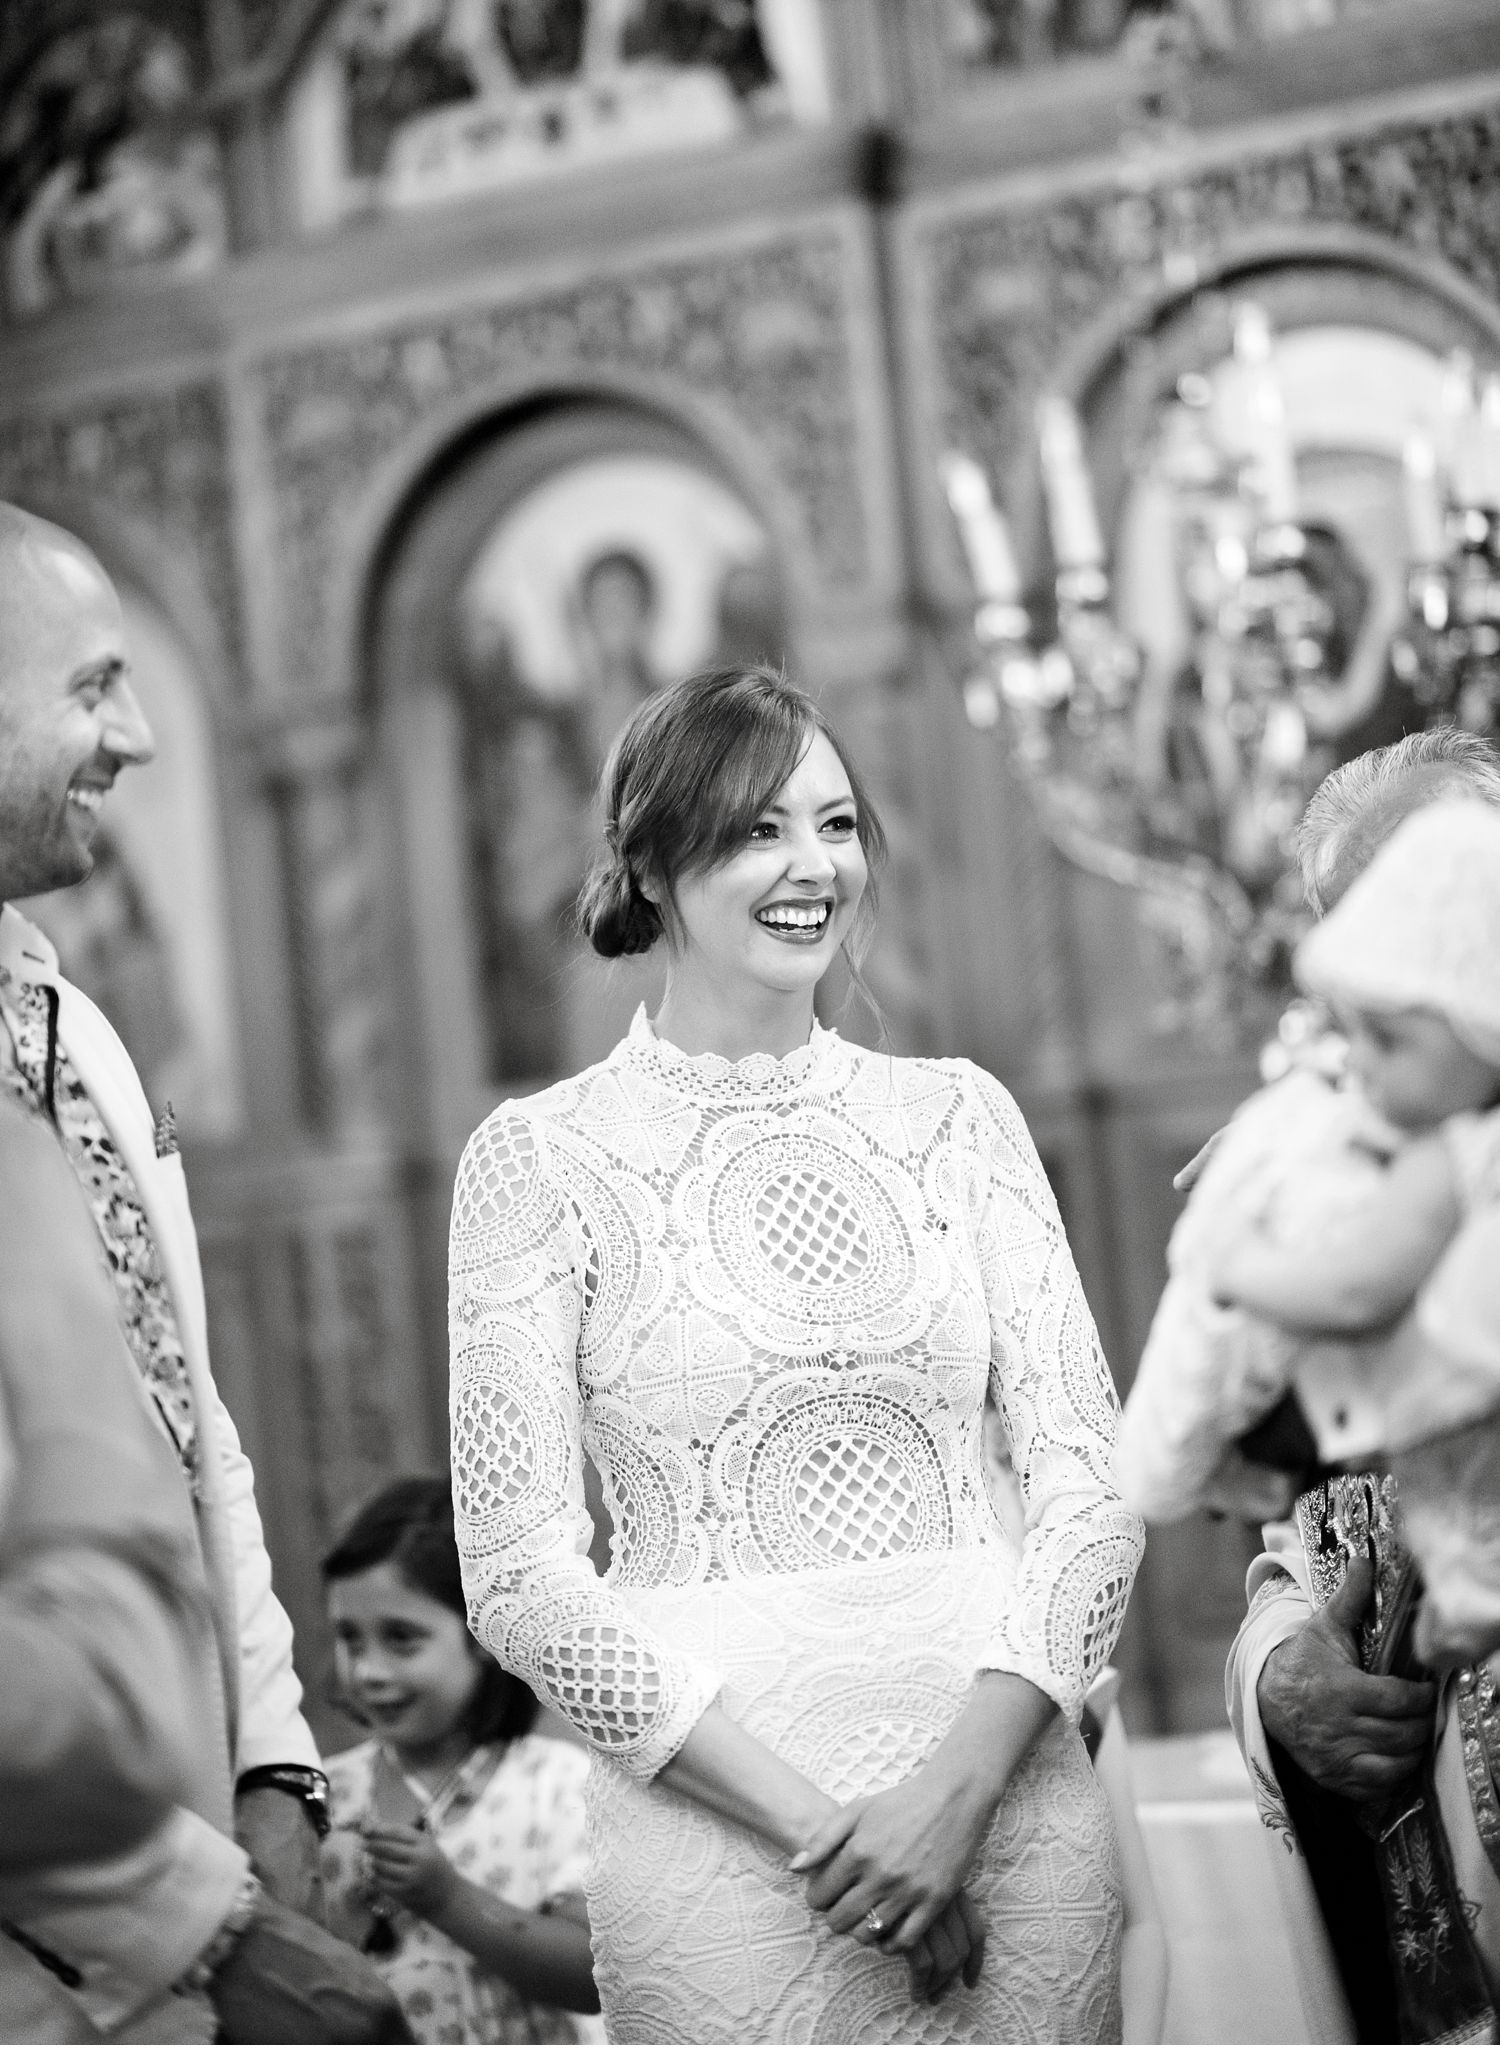 baby-natural-christening-baptism-photographer-melbourne-bec-stewart-lifestyle-photography-31.jpg